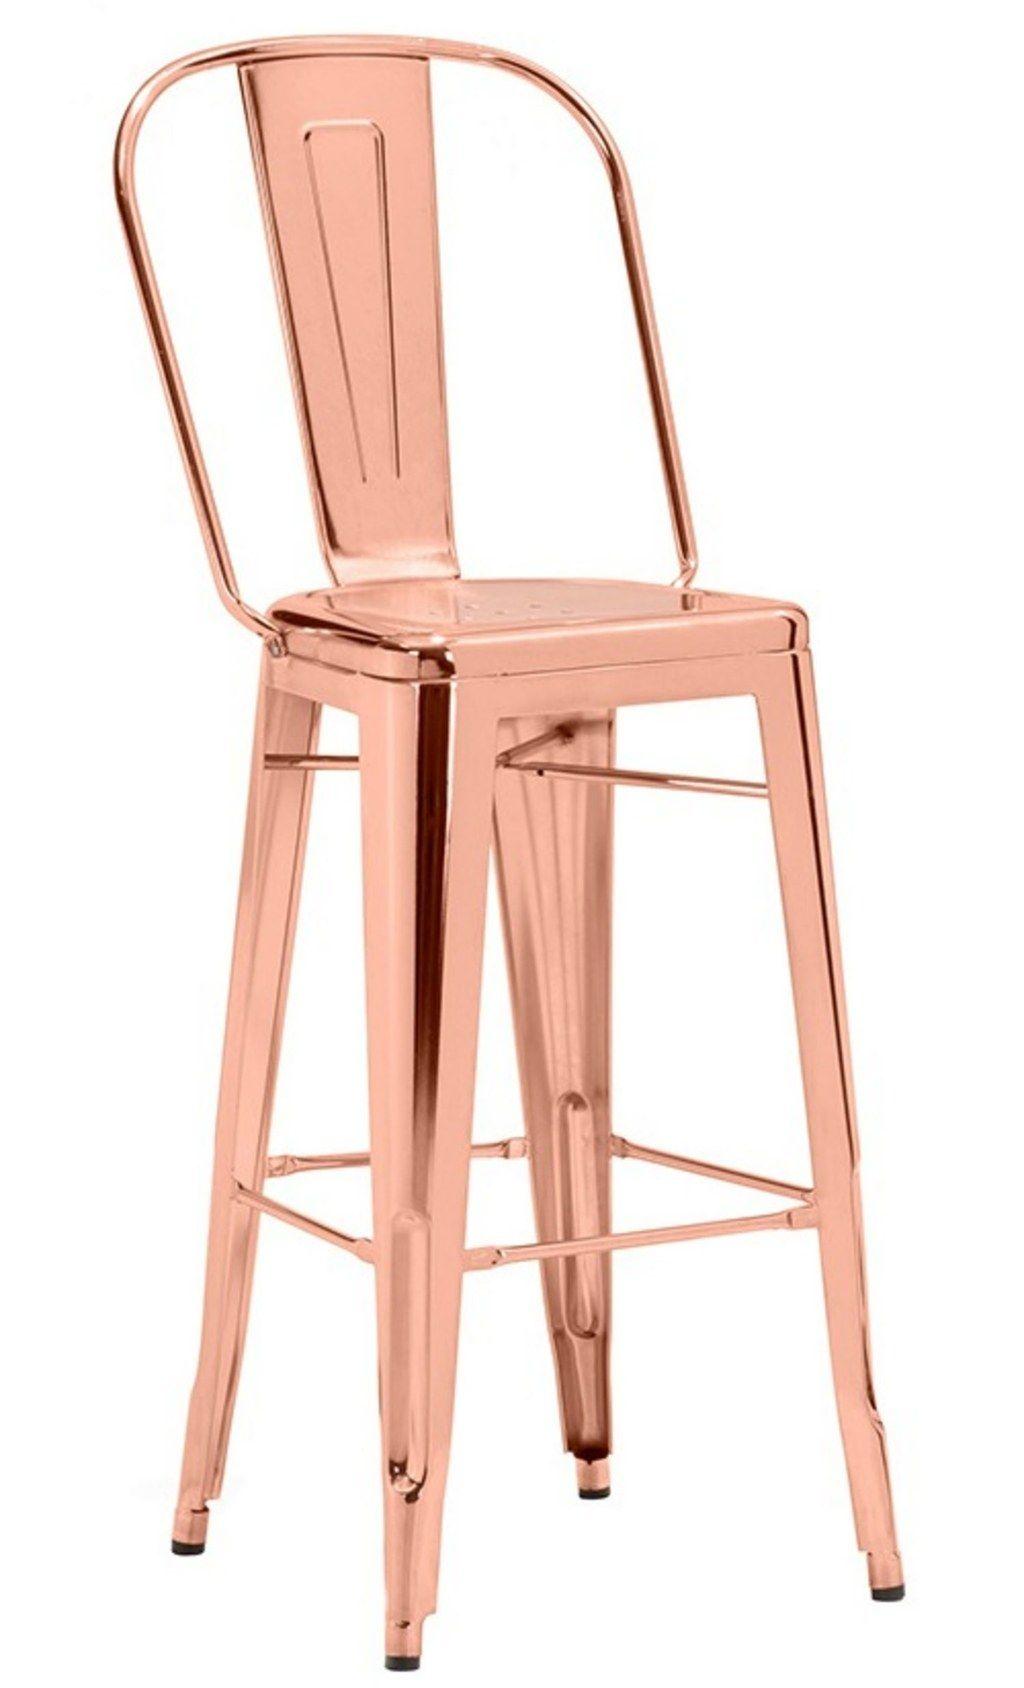 Home 2016 02 4 rose gold furniture interior design 0218 courtesy main jpg 1024x1688